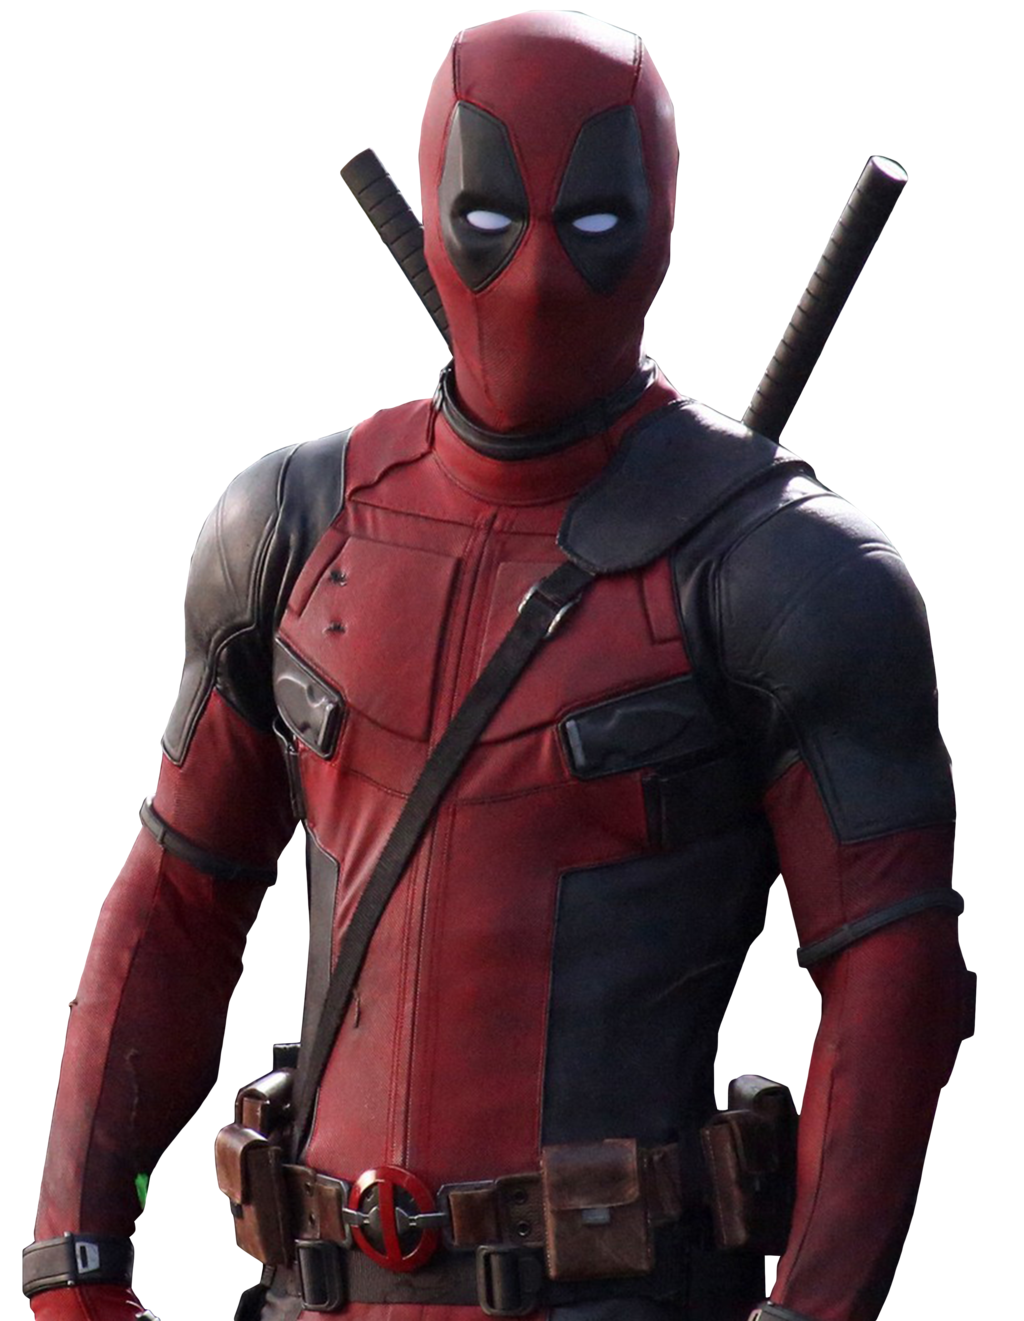 Captain Deadpool Film America Transparent Free Hq Image Super Heroi Olhos Desenho Herois